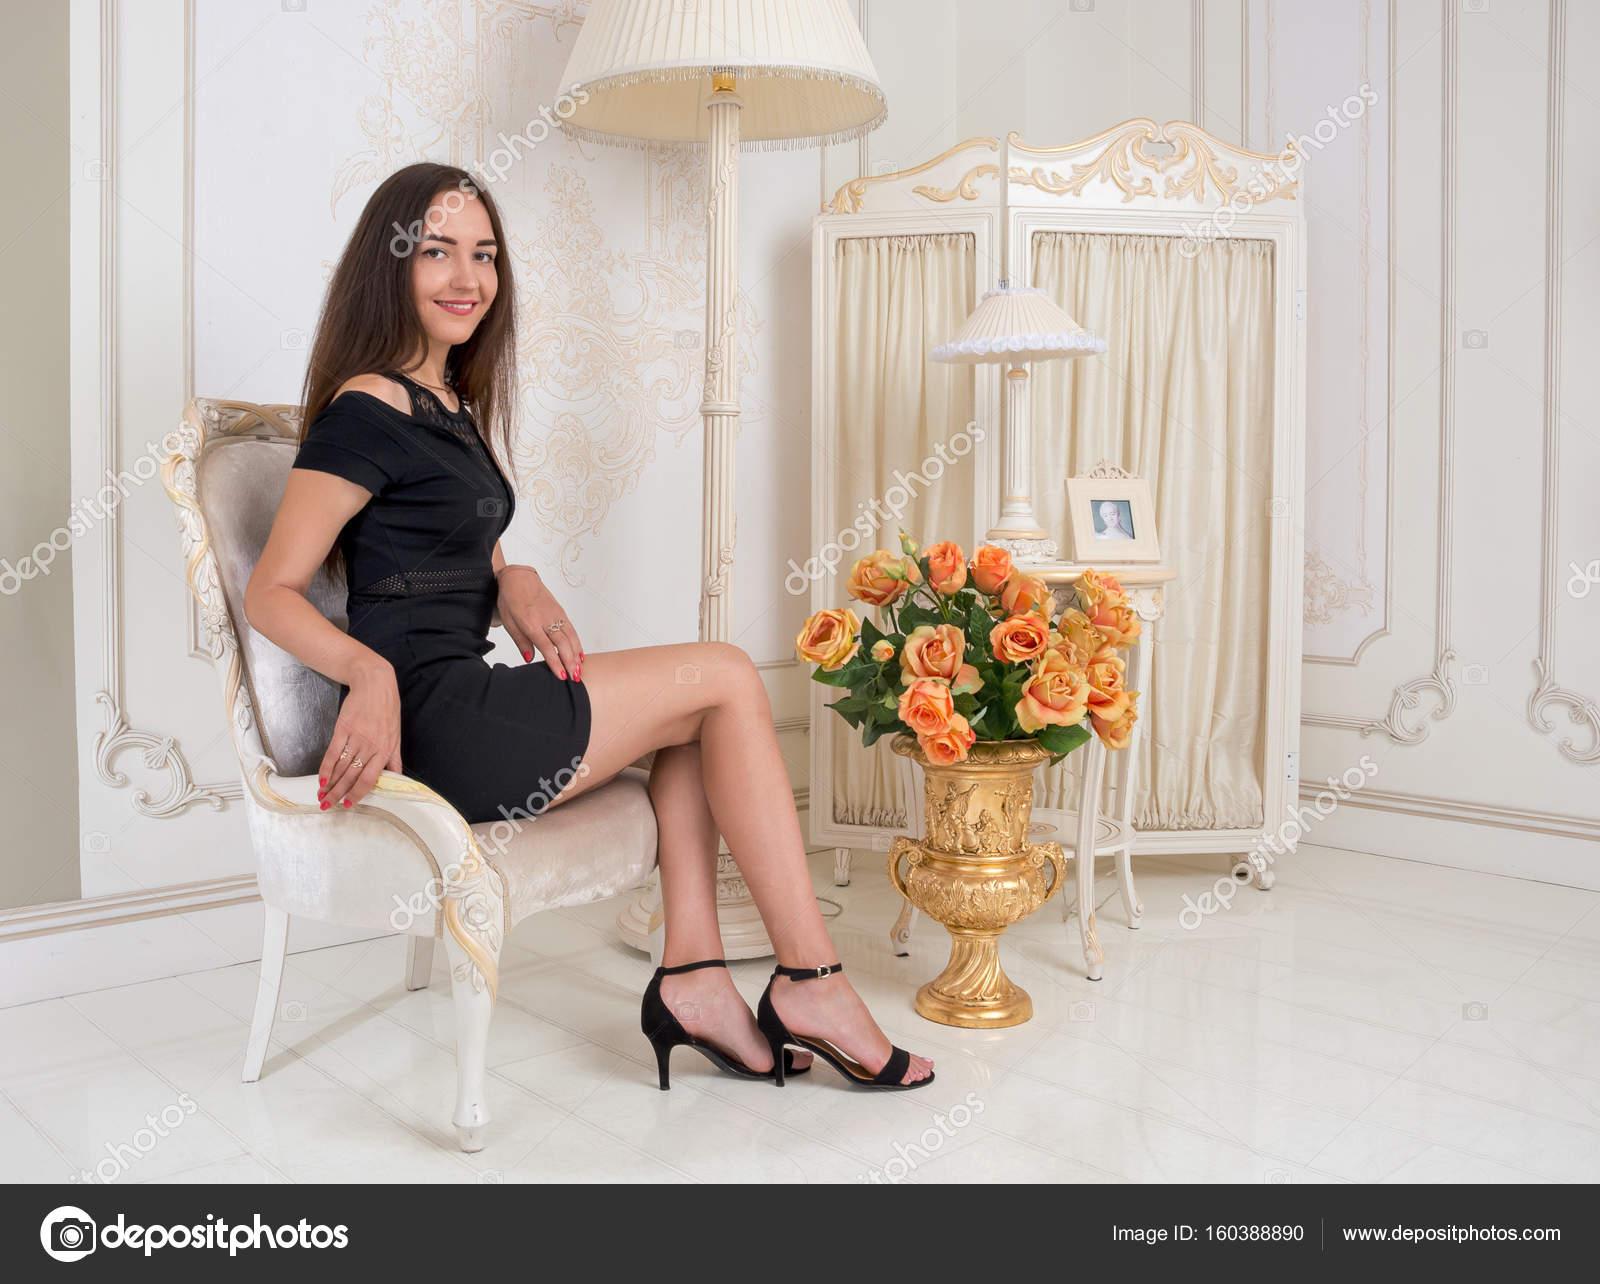 3670d621b79f Νεαρή γυναίκα με ένα κοντό μαύρο φόρεμα που κάθεται σε μια καρέκλα μπροστά  o — Φωτογραφία